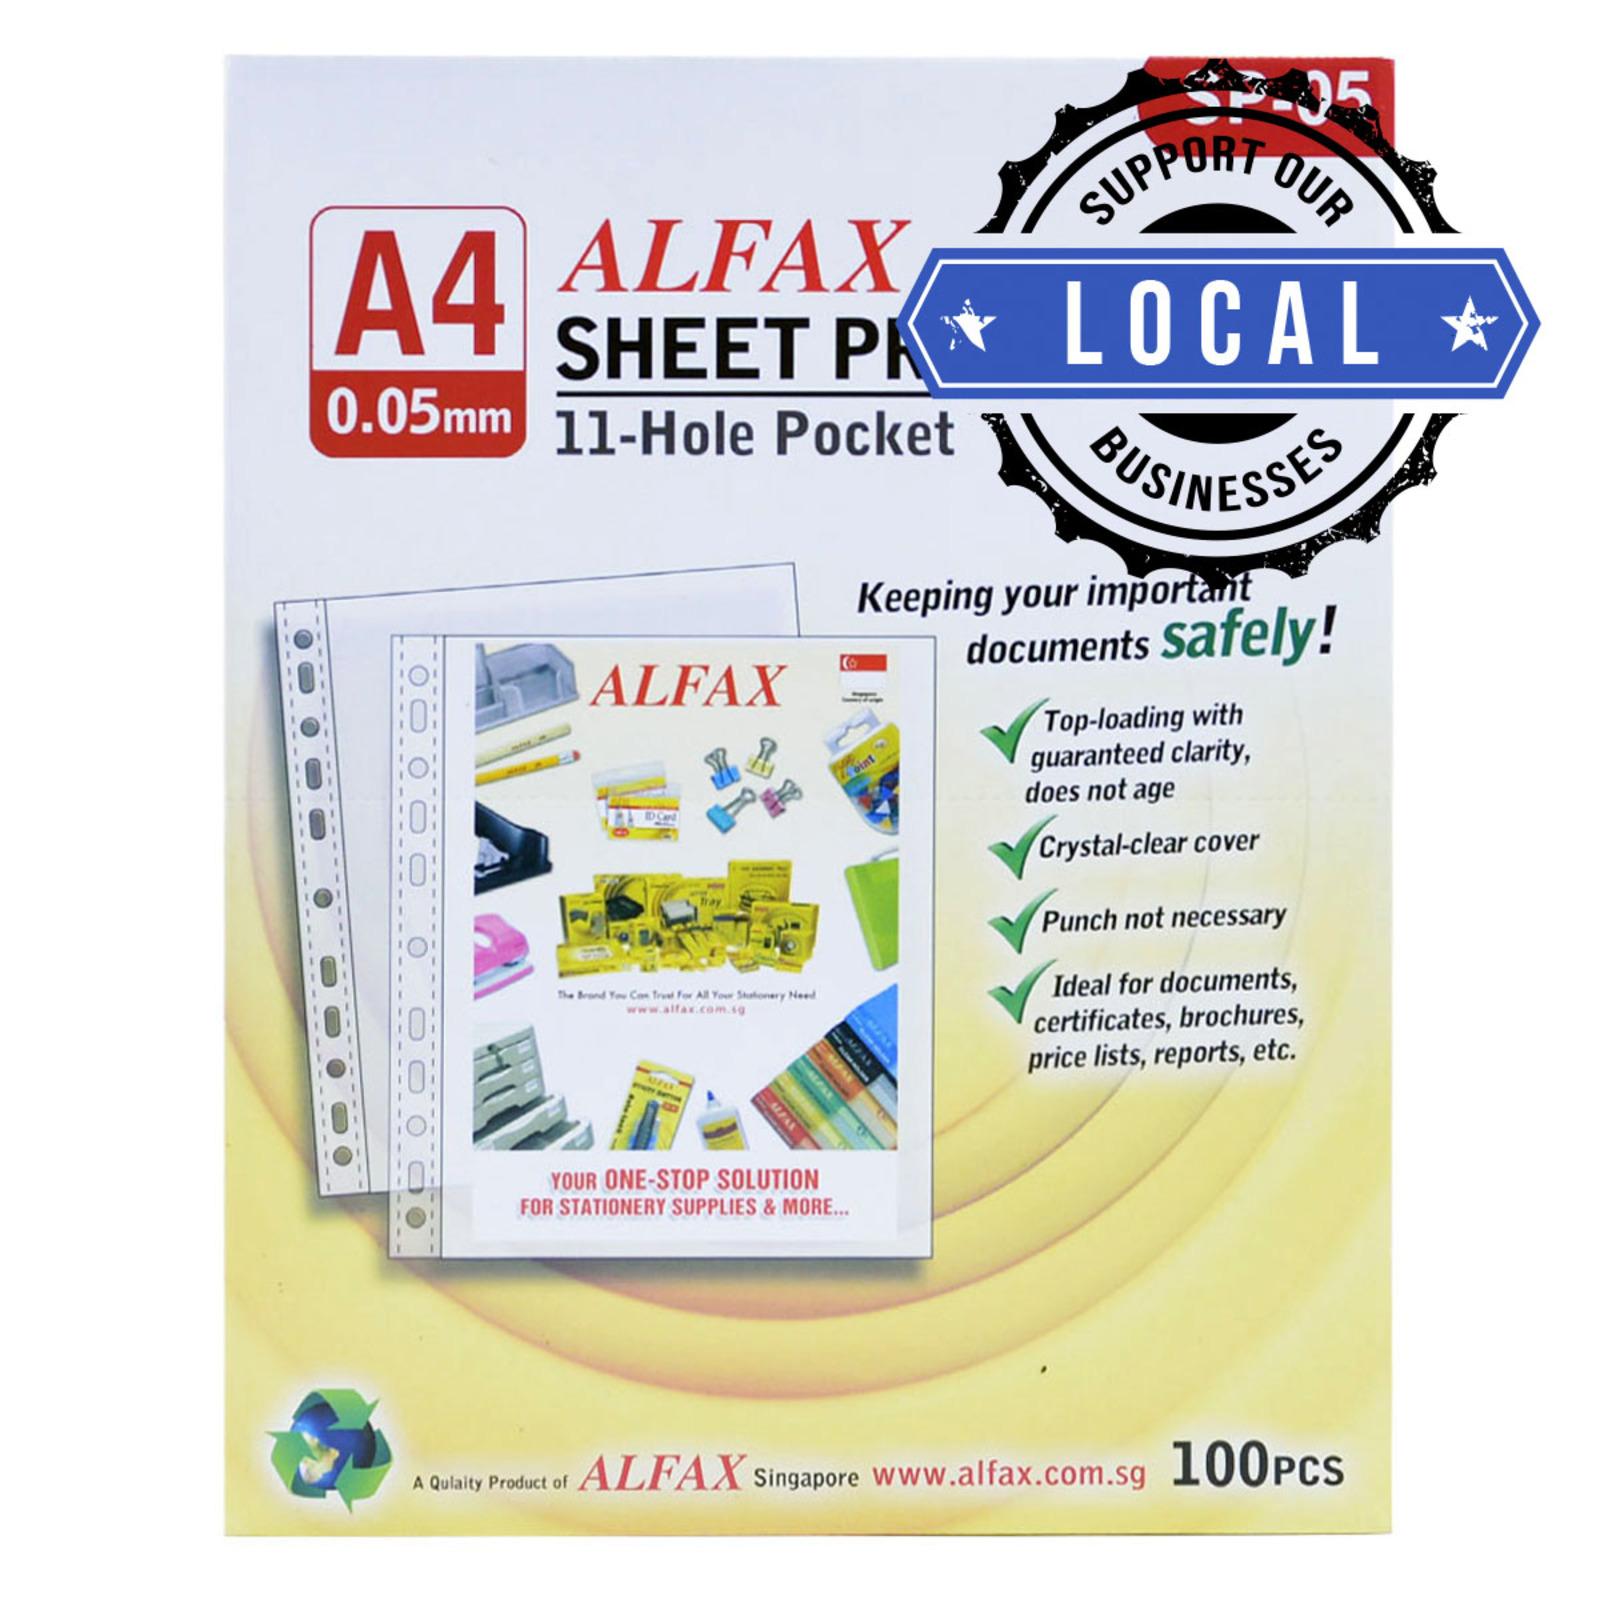 ALFAX SP05 Sheet Protector 11 Hole 0.05mm A4